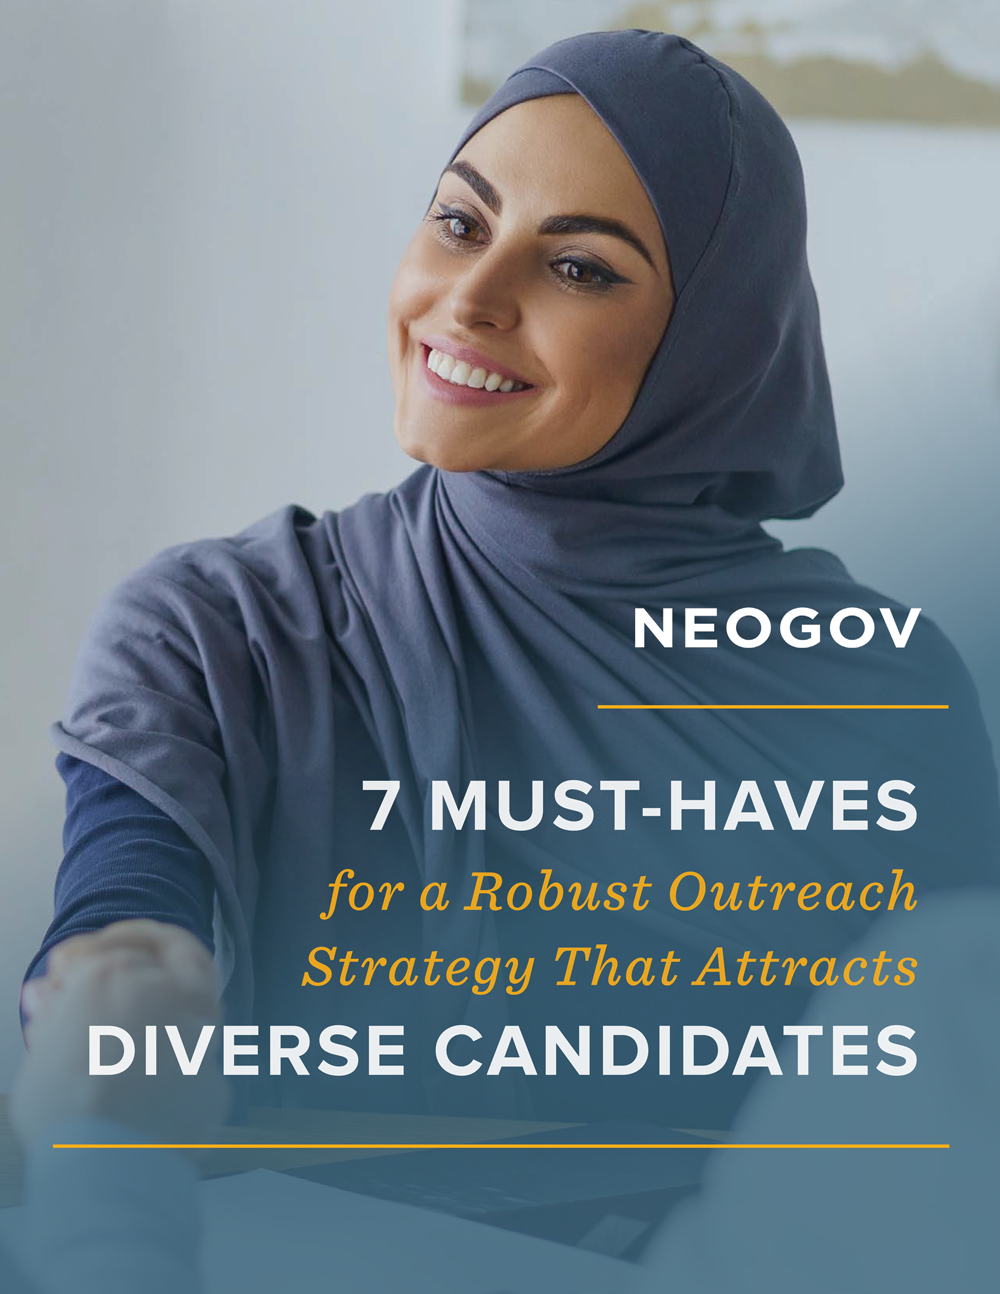 NEOGOV 7 Must-Haves for Diverse Candidates